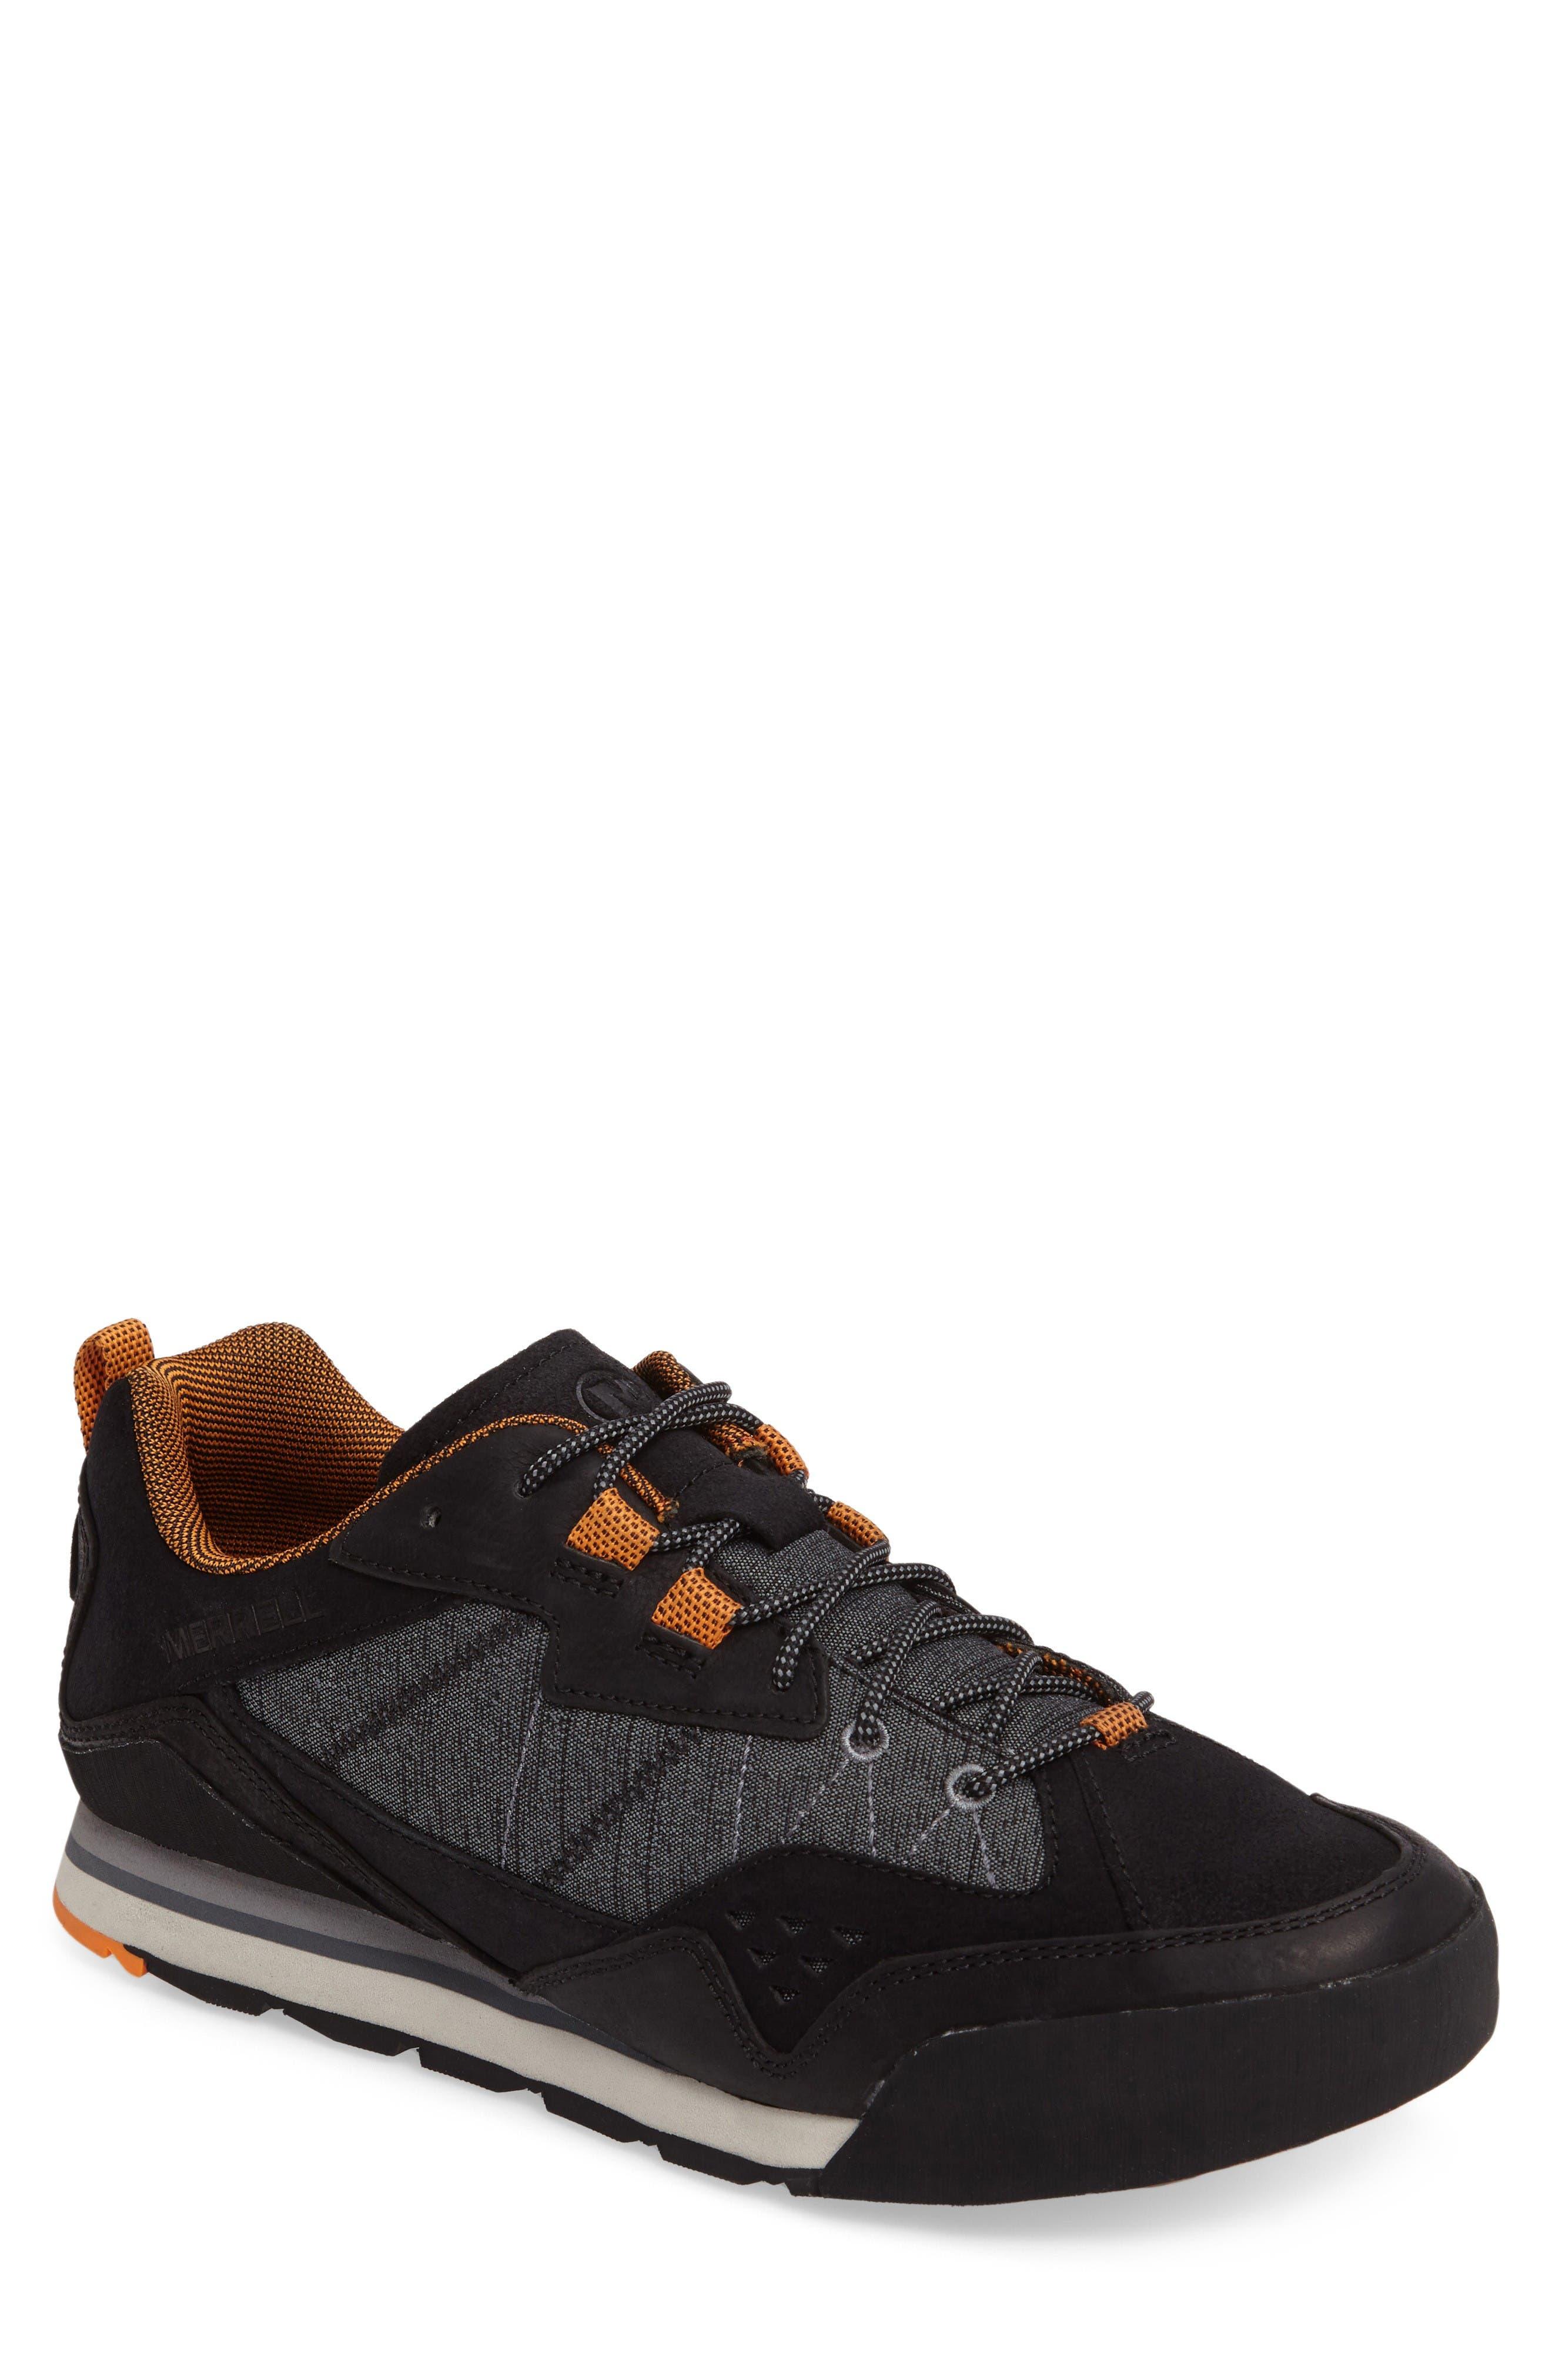 Burnt Rock Sneaker,                             Main thumbnail 1, color,                             Black